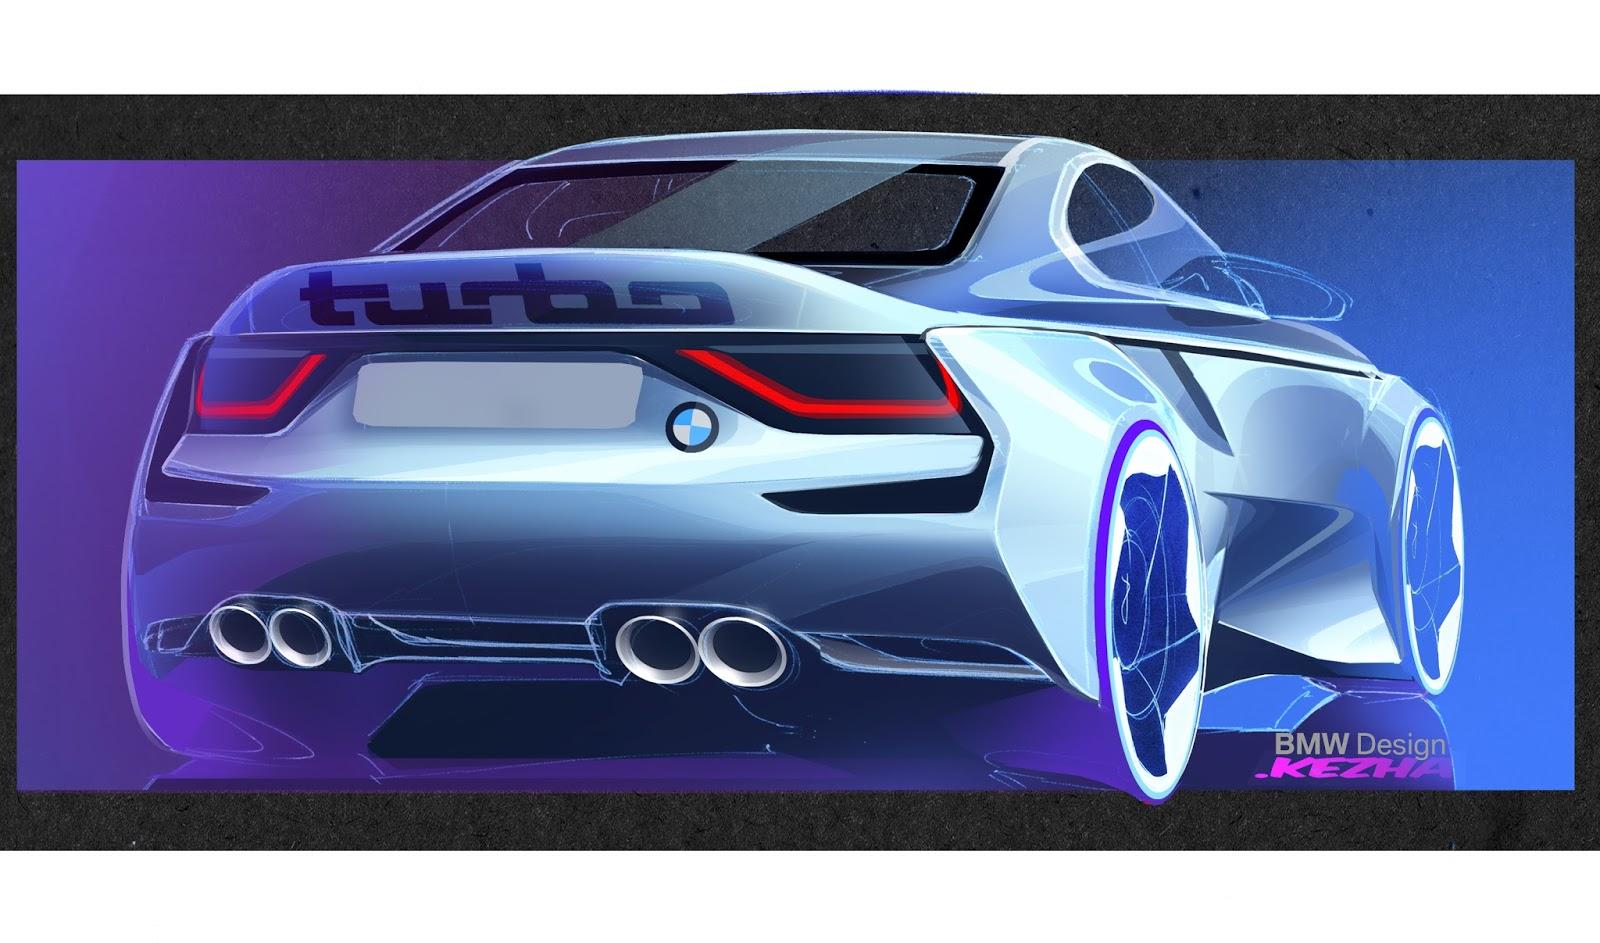 P90219732 highRes bmw 2002 hommage des 1 H BMW γιορτάζει τα 50 χρόνια της θρυλικής 2002 turbo και παρουσιάζει την Bmw 2002 Hommage BMW, BMW 2002, BMW 2002 turbo, BMW Concept, BMW Hommage, supercars, videos